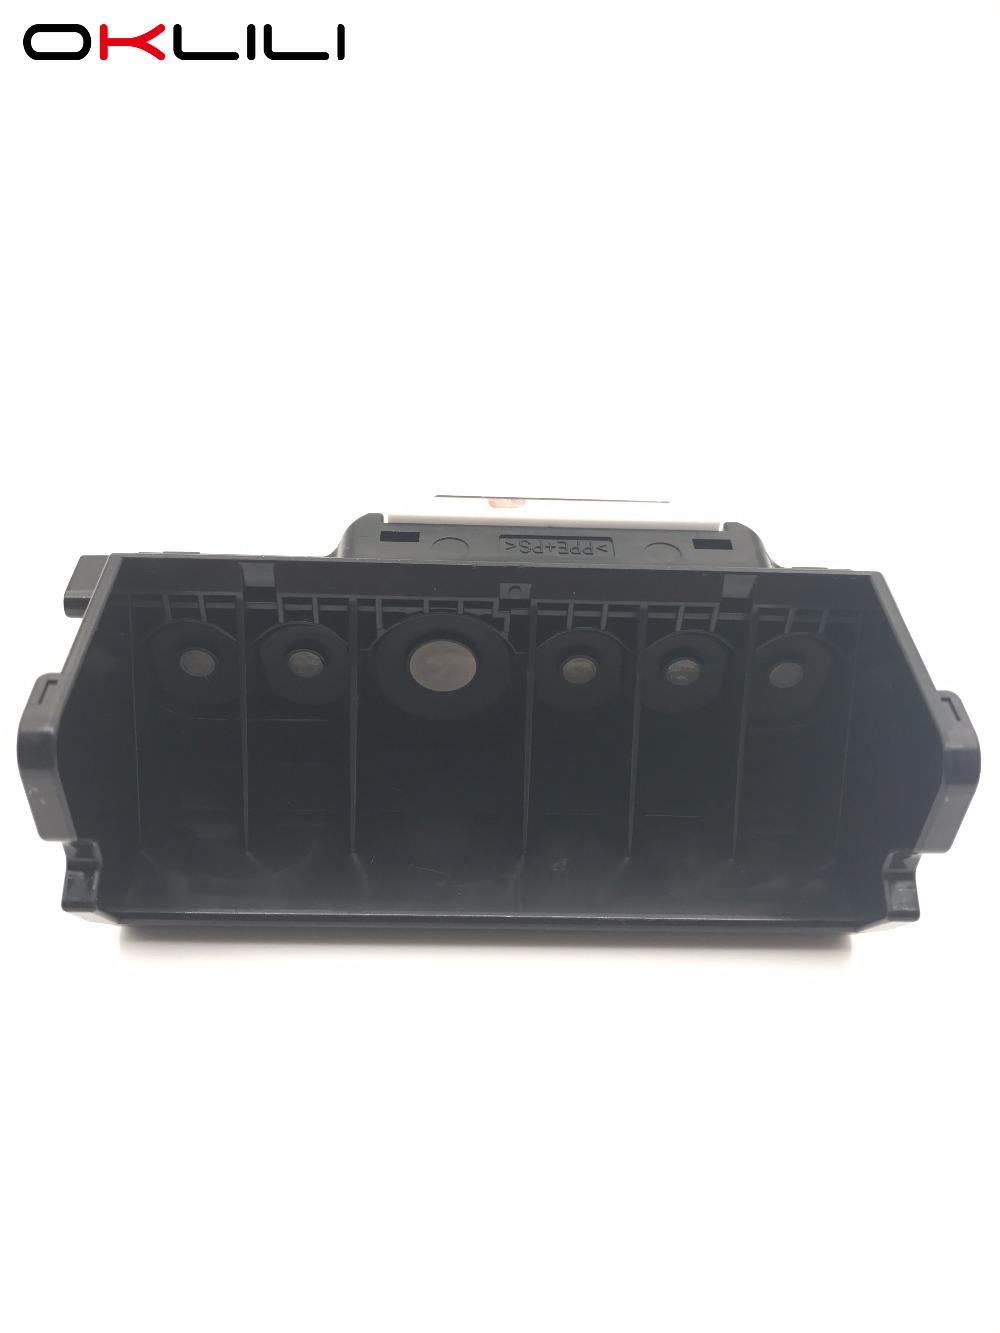 OKLILI QY6-0078 Printhead Print Head Printer for Canon MP990 MP996 MG6120 MG6140 MG6180 MG6280 MG8120 MG8180 MG8280 MG6250<br>